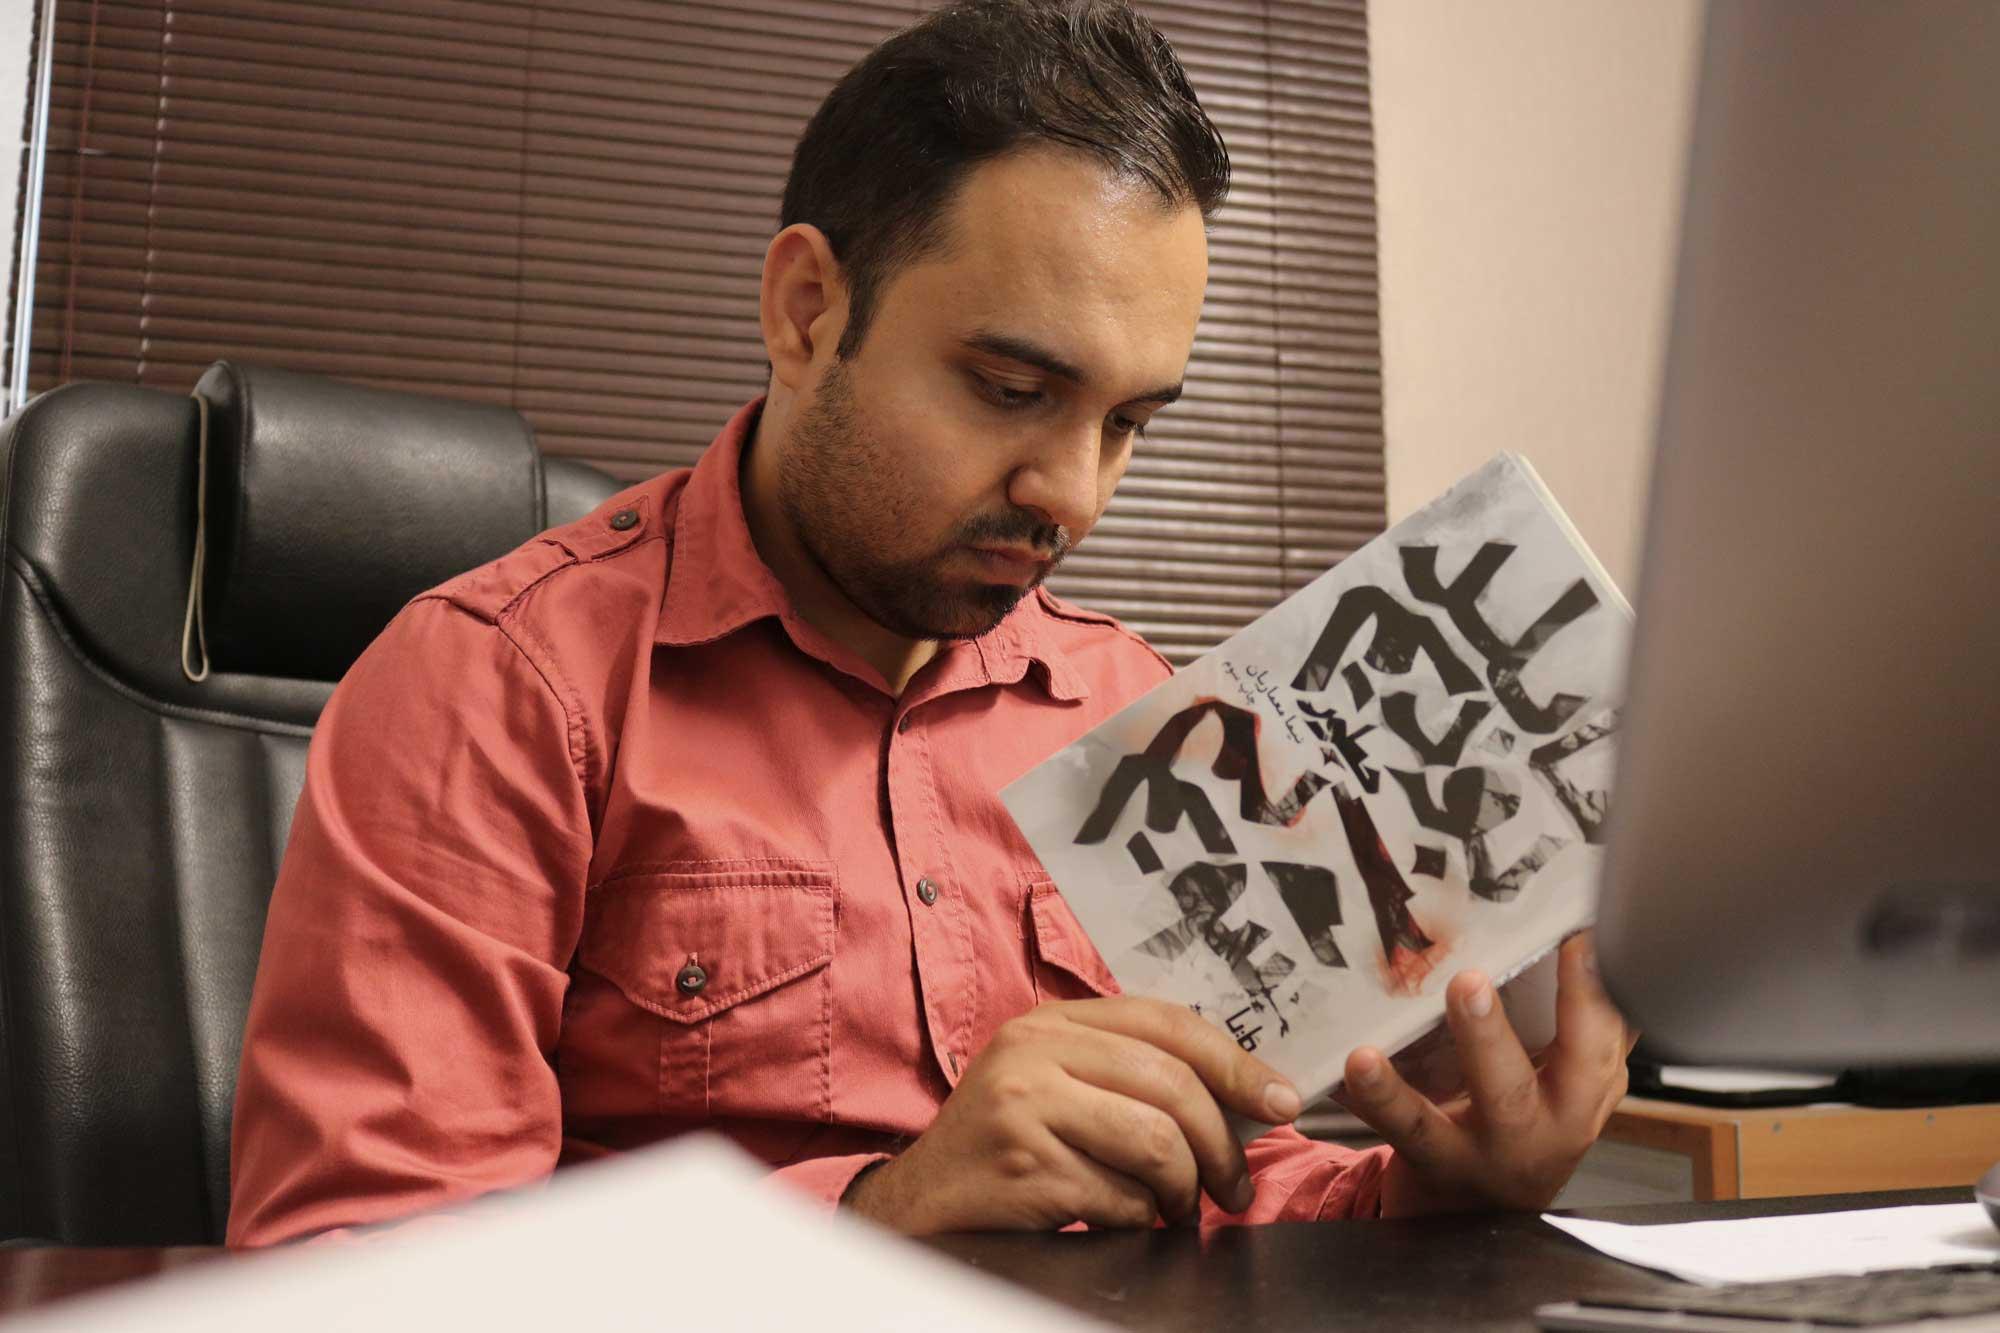 چاپ جدید کتاب ما بلد بودیم چطور گم شویم، اثر نیما معماریان، کتاب ویژه چالش میلاد تا فتح 2 خواهد بود